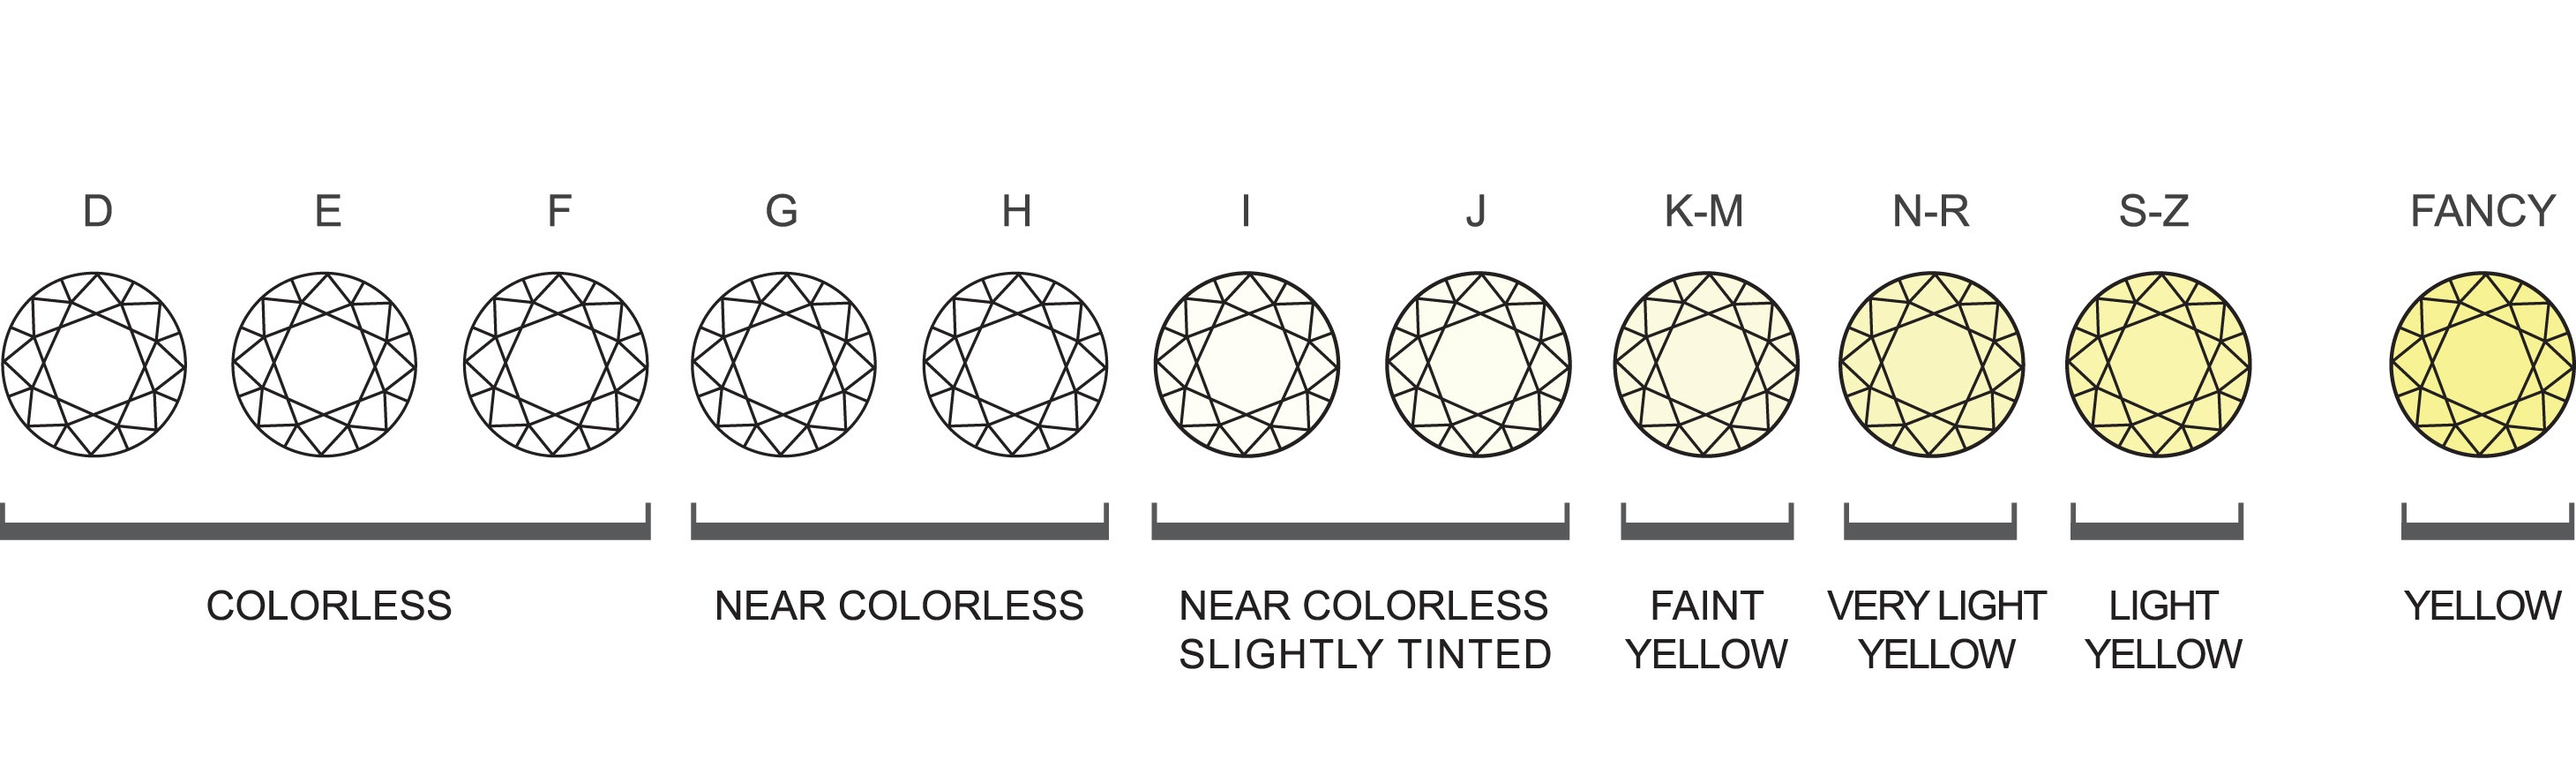 Solitaire diamine jewels llc diamond color scale nvjuhfo Images